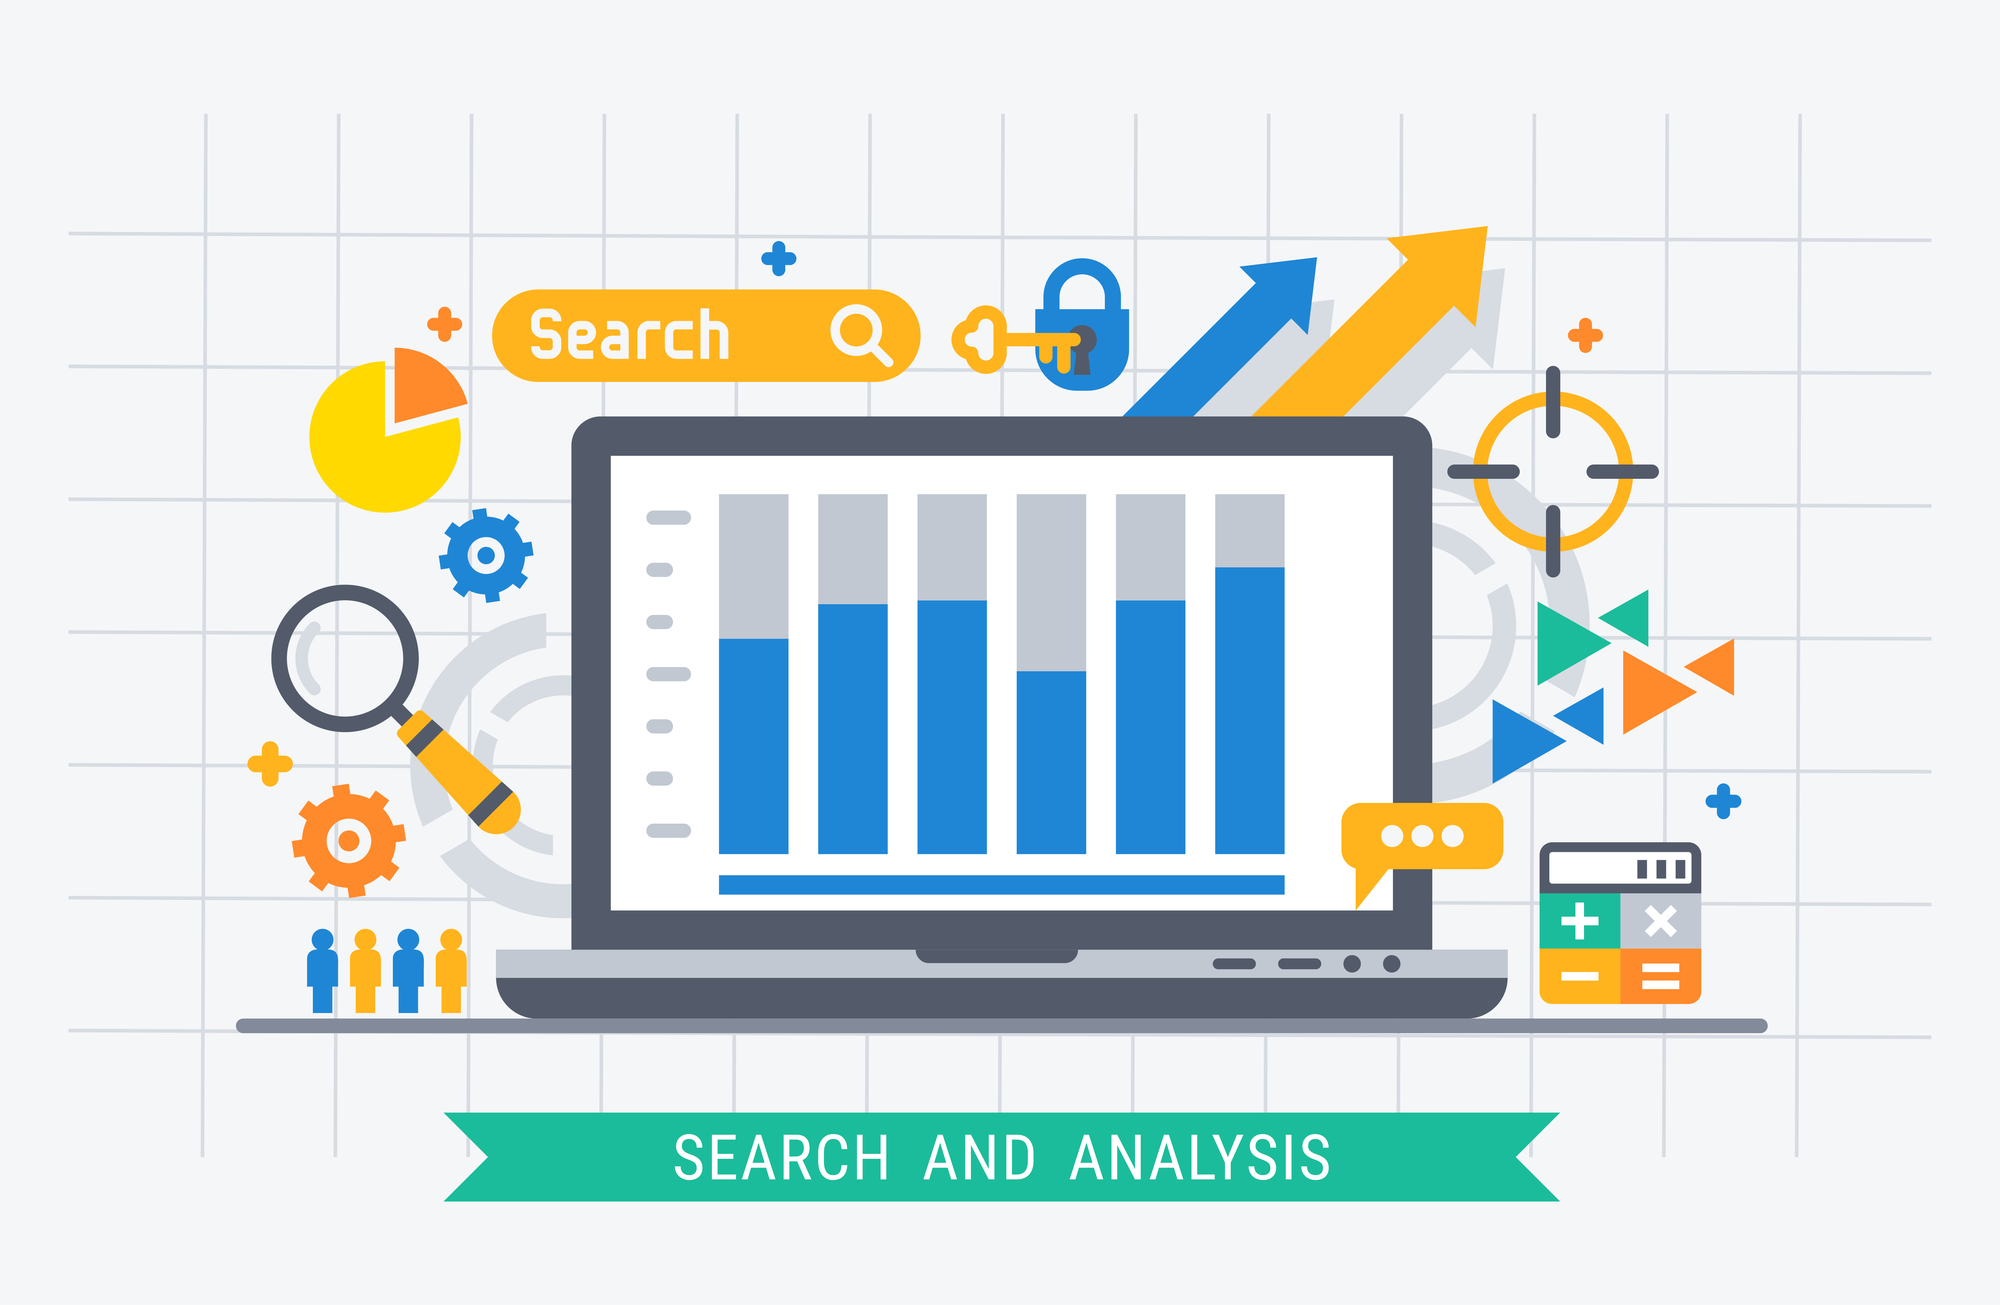 SEO施策に欠かせない検索ボリュームとは?効果的に調べる方法を解説